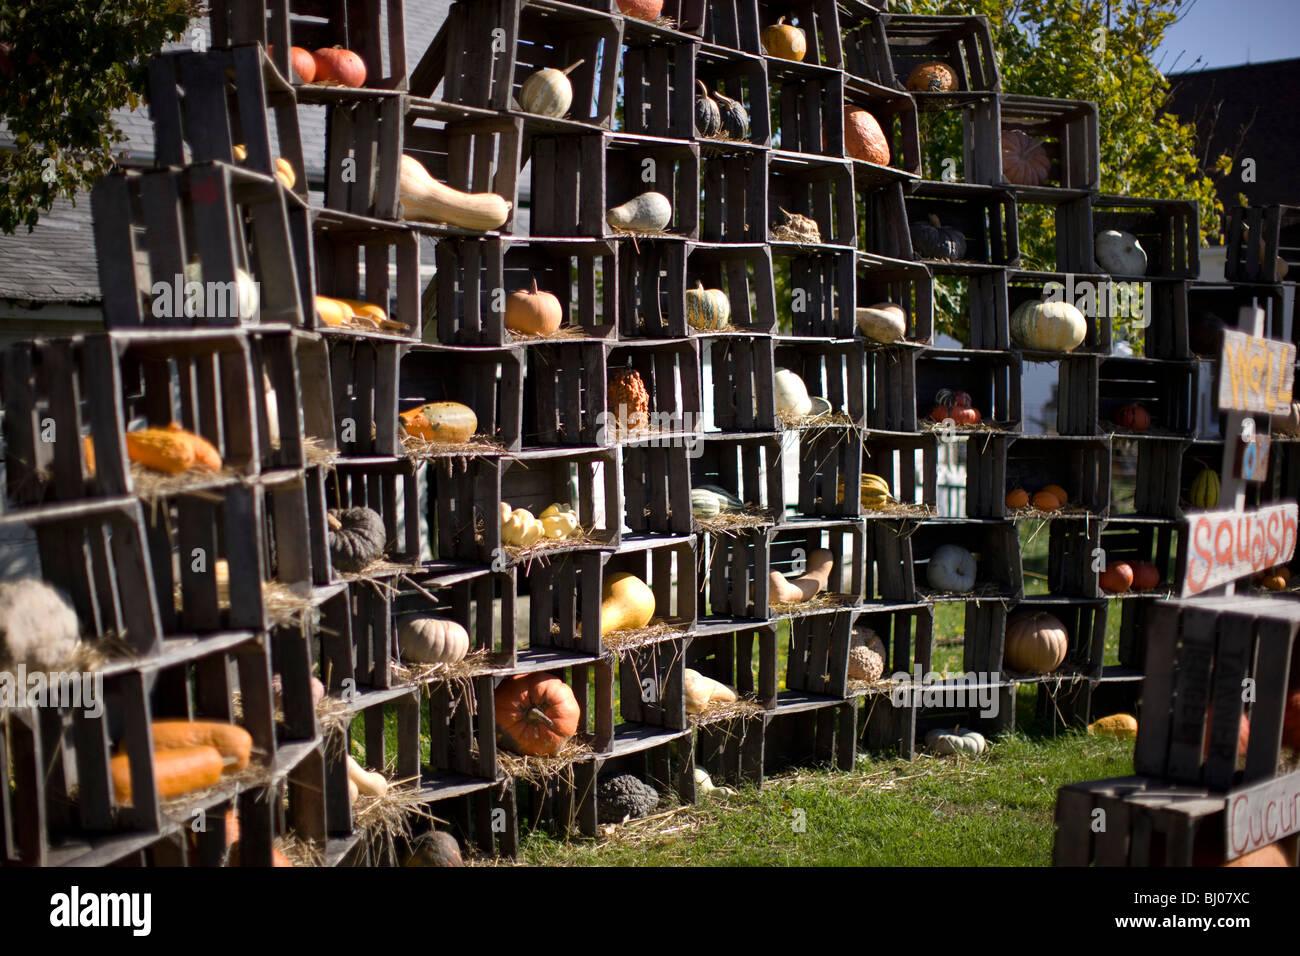 Squash in vendita visualizzati in casse di legno. Immagini Stock